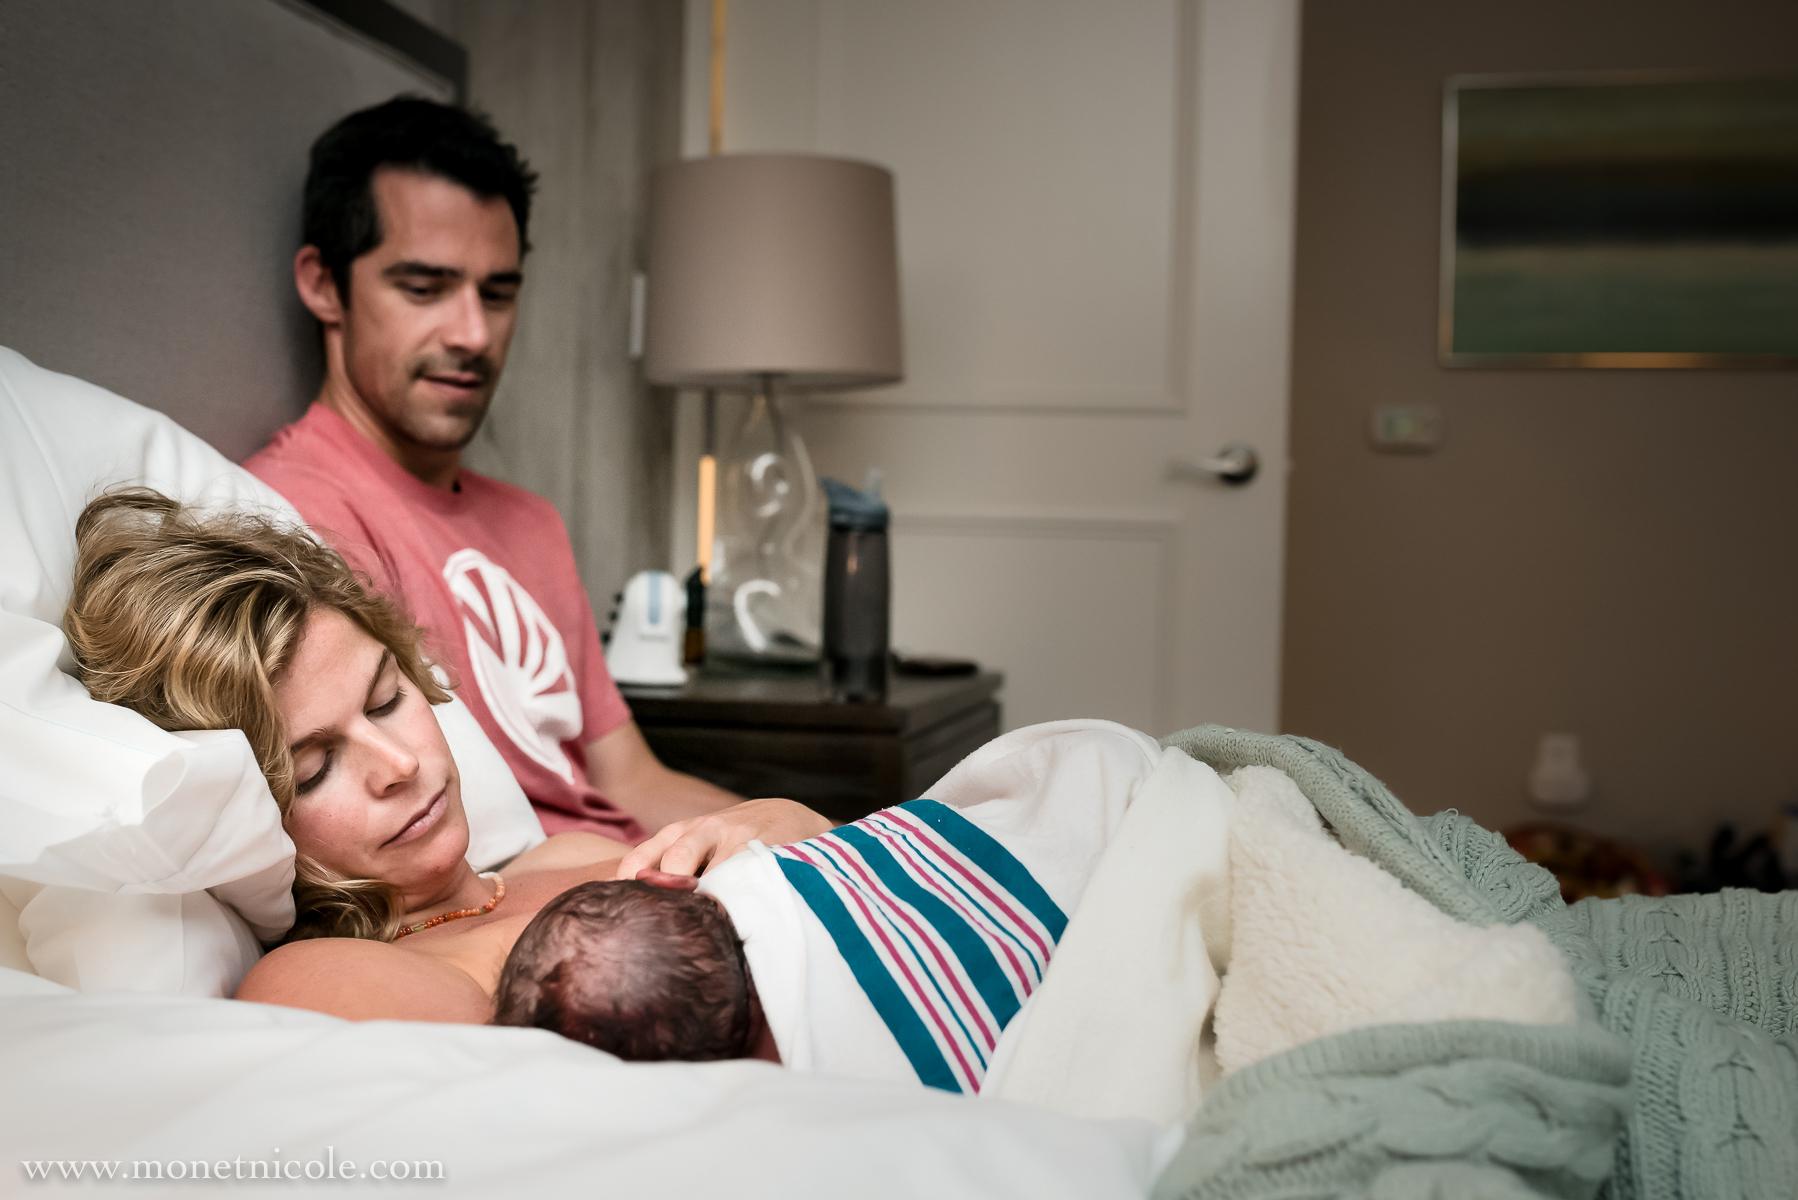 baby-co-birth-center-birth-denver